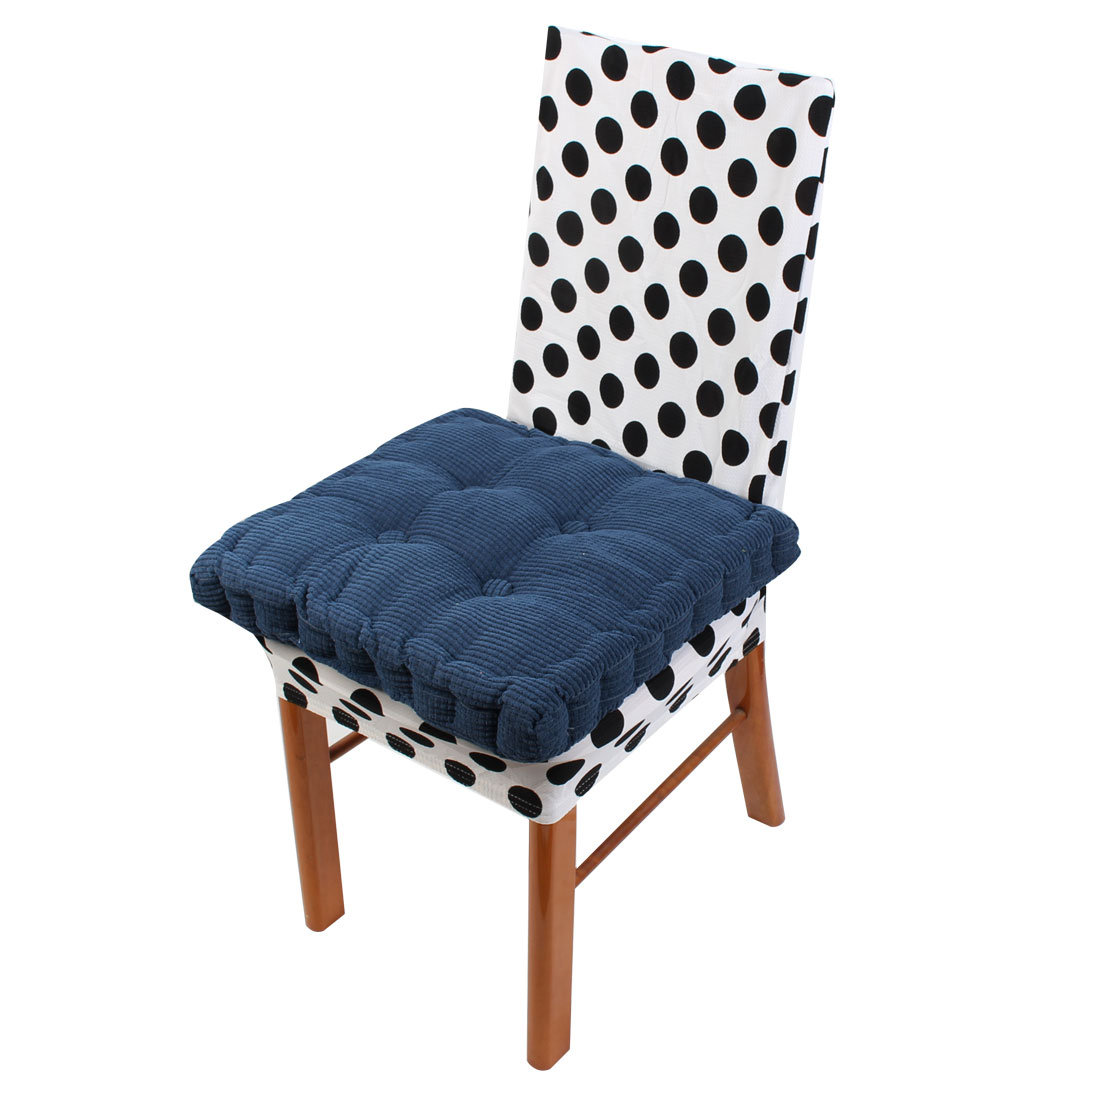 Household Corduroy Square Shape Thicken Chair Cushions Gray Blue 43.5cm x 43.5cm